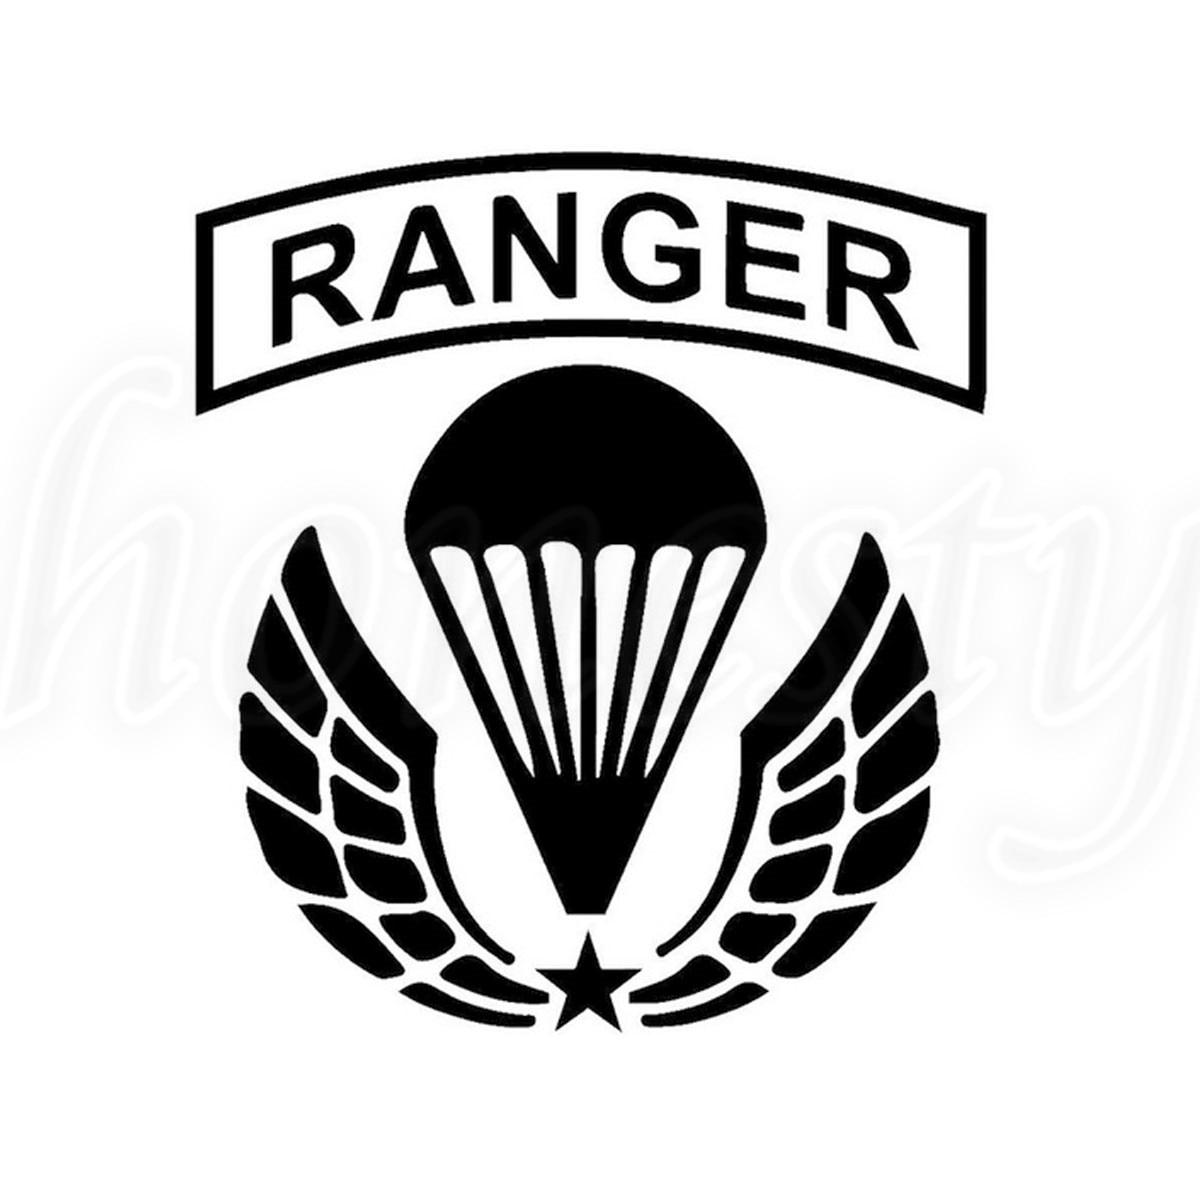 Yuksek Kaliteli Toptan Sat Ranger Sticker Cindeki Ranger